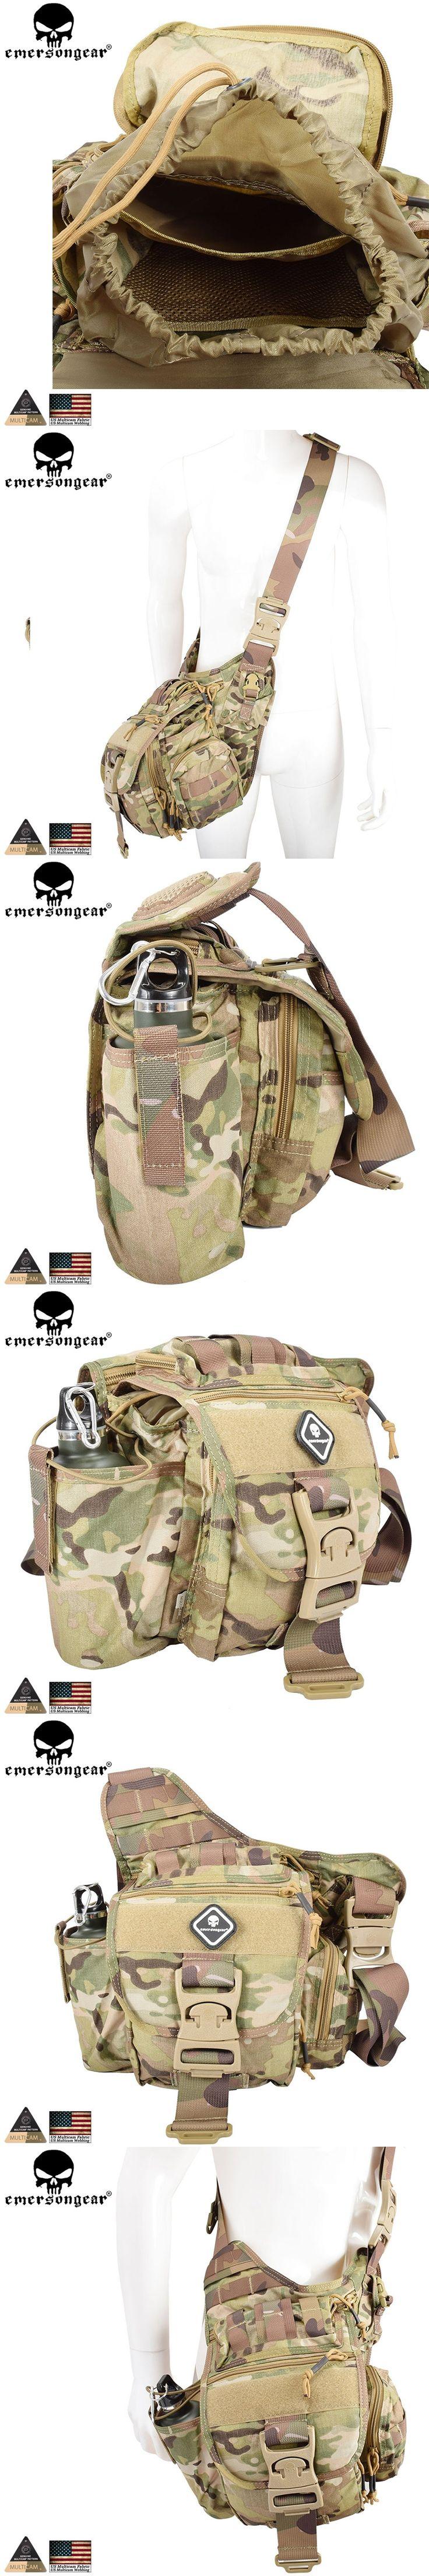 EMERSONGEAR Jumbo Versipack Tactical Sling Pack  Recon Military Tactical Gear Bag  Multicam Black Khaki EM8345